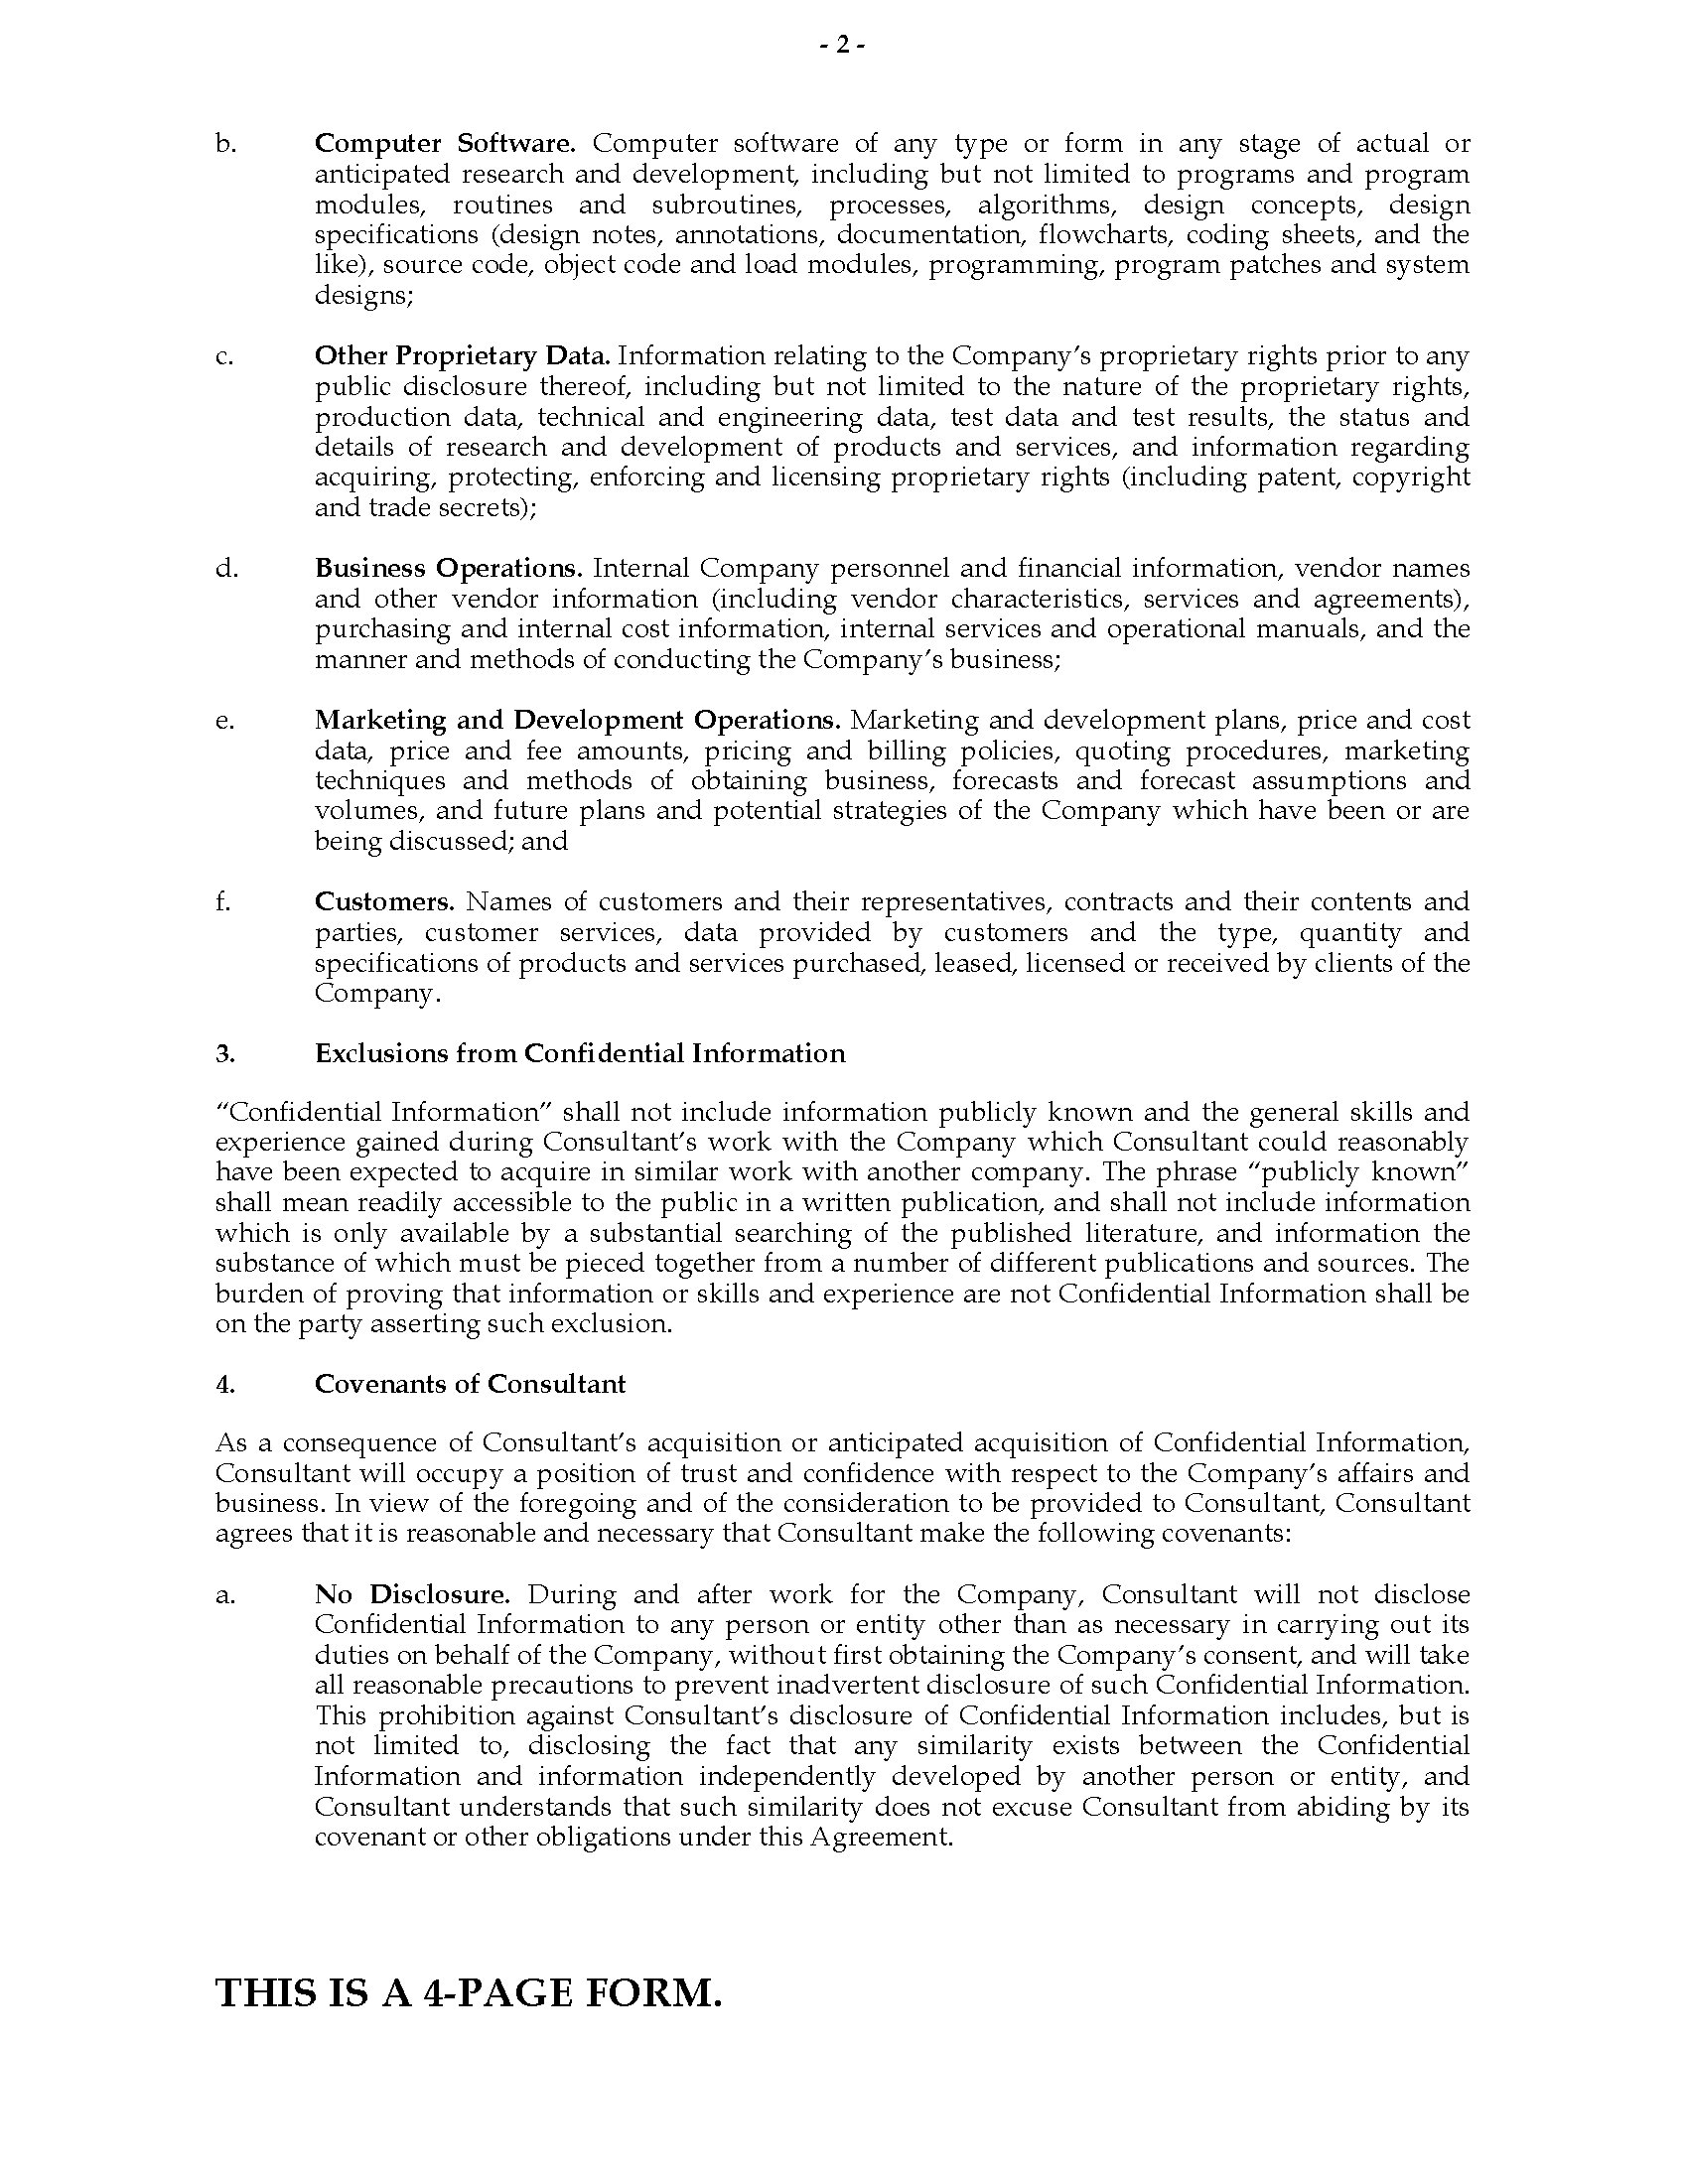 Business Agreements Sample Vendor Confidentiality Agreement Essay 0006497 Confidentiality  Agreement For Consultant Business Agreements Sample Vendor